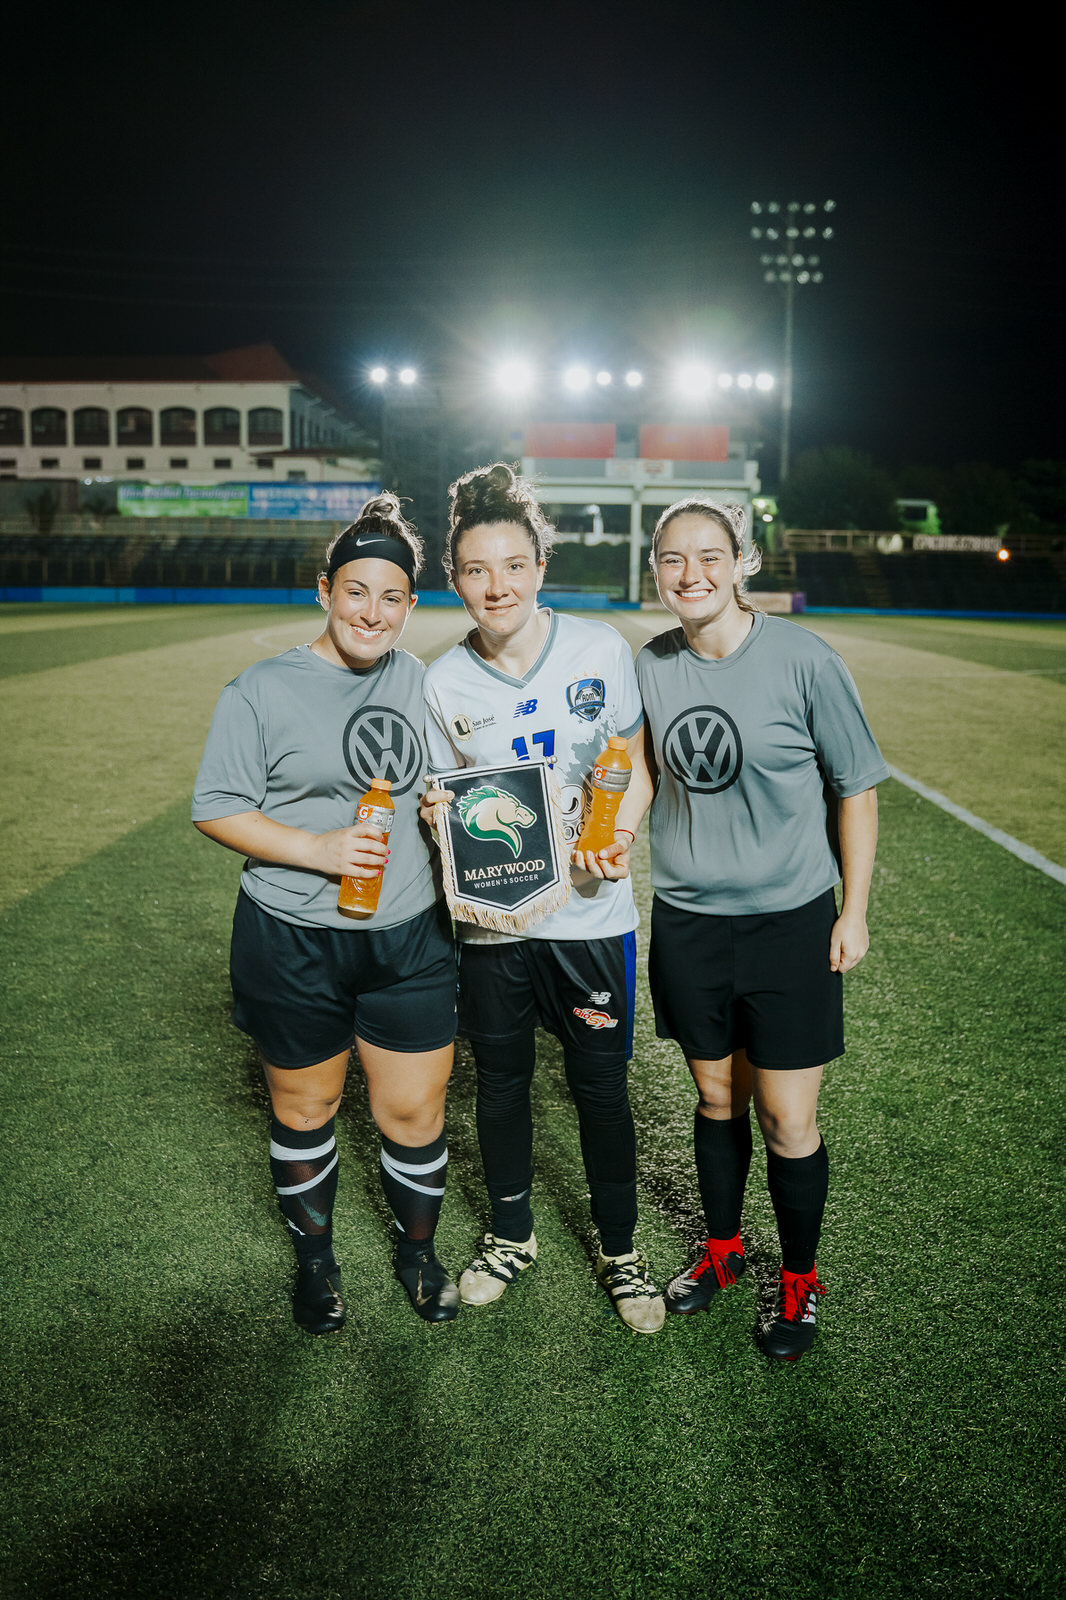 Marywood-Womens-Soccer-15